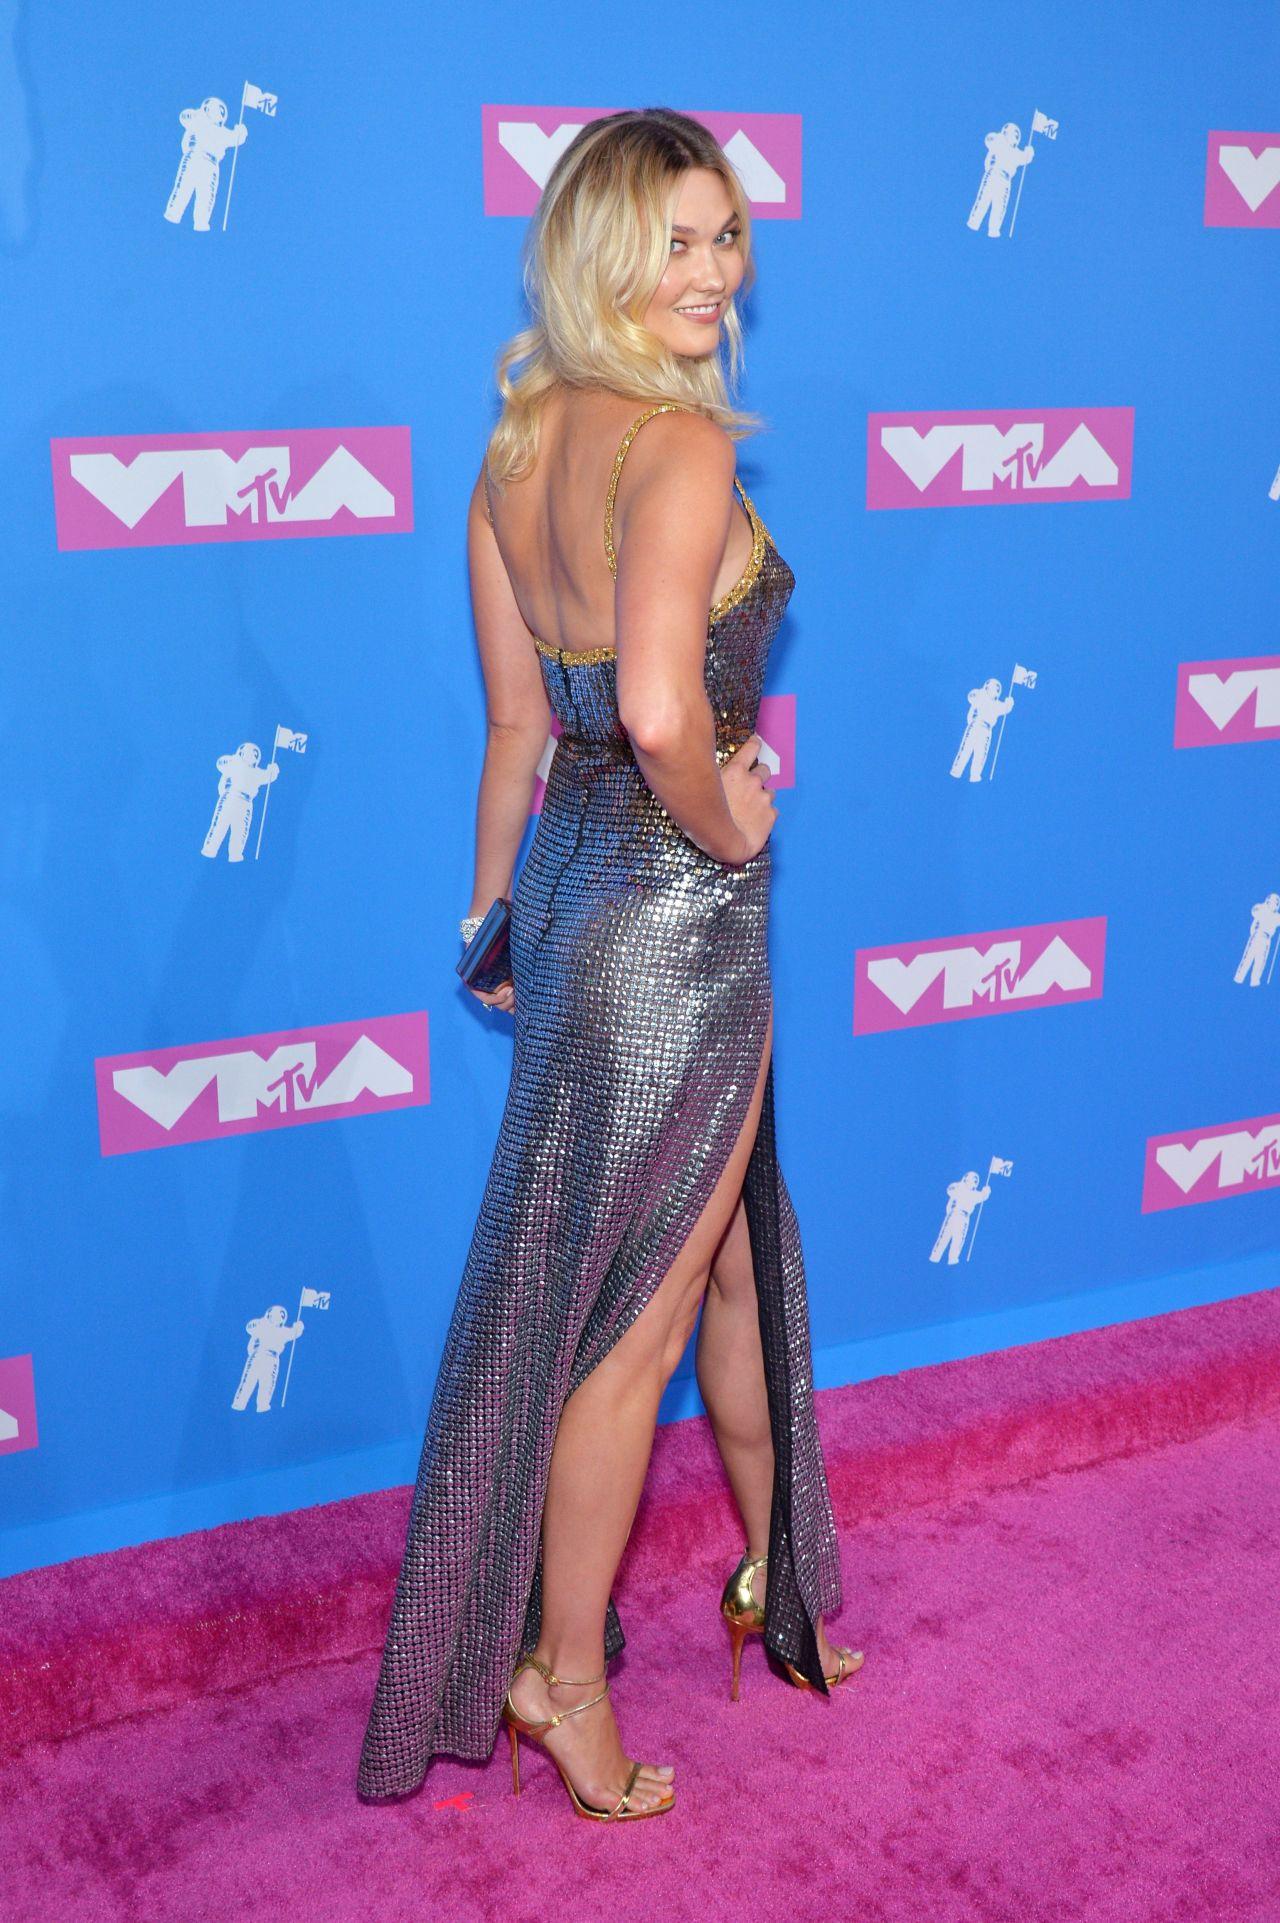 Karlie Kloss 2018 MTV Video Music Awards